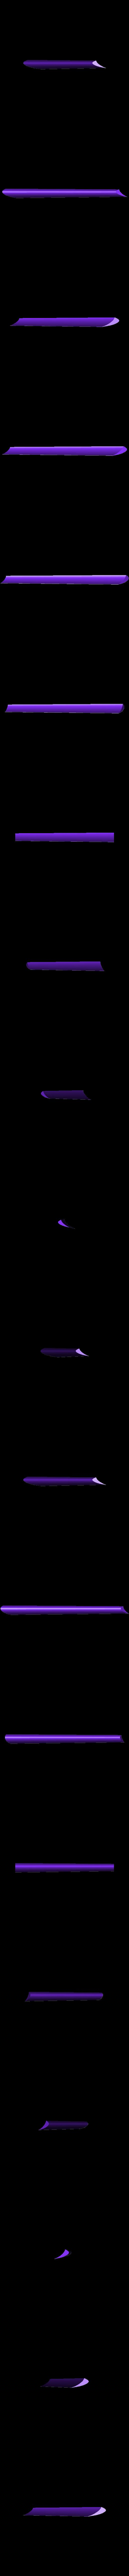 front_wing_1.stl Download free STL file Leading-Edge Slats for Horten Wing Stiletto • 3D printer model, wersy